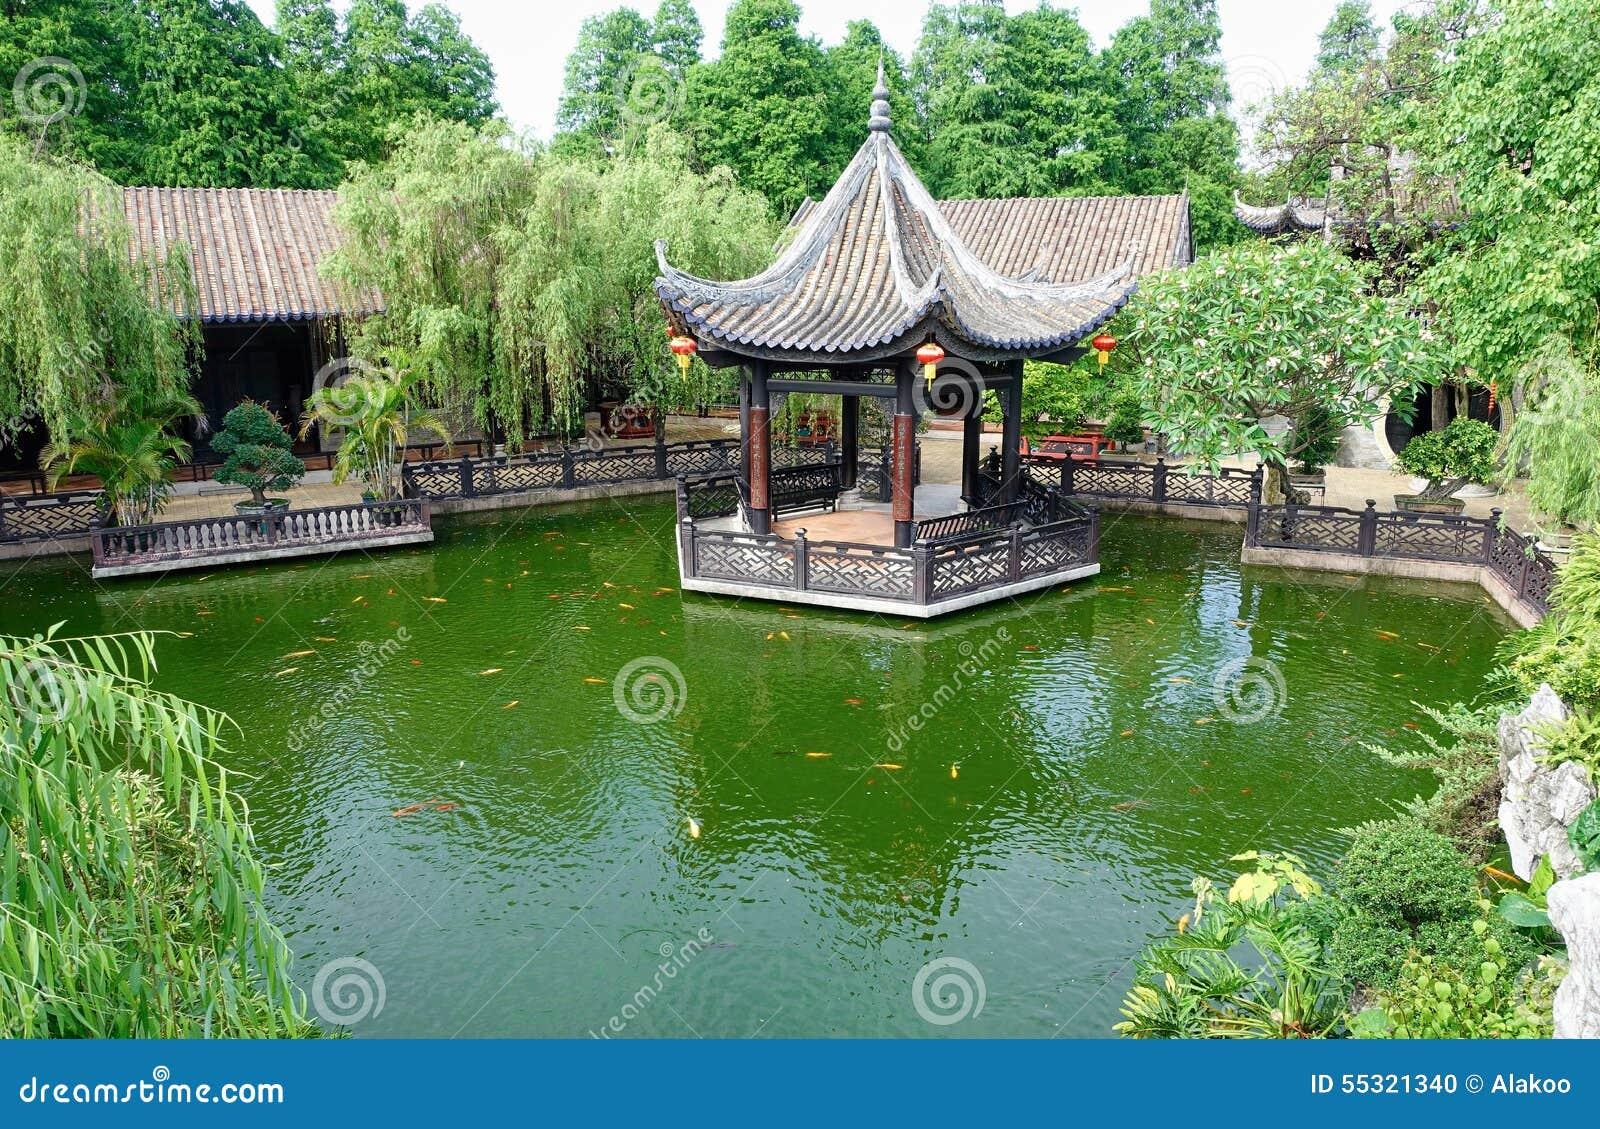 Landscaping Gazebo Chinese Garden Stock Photo Image